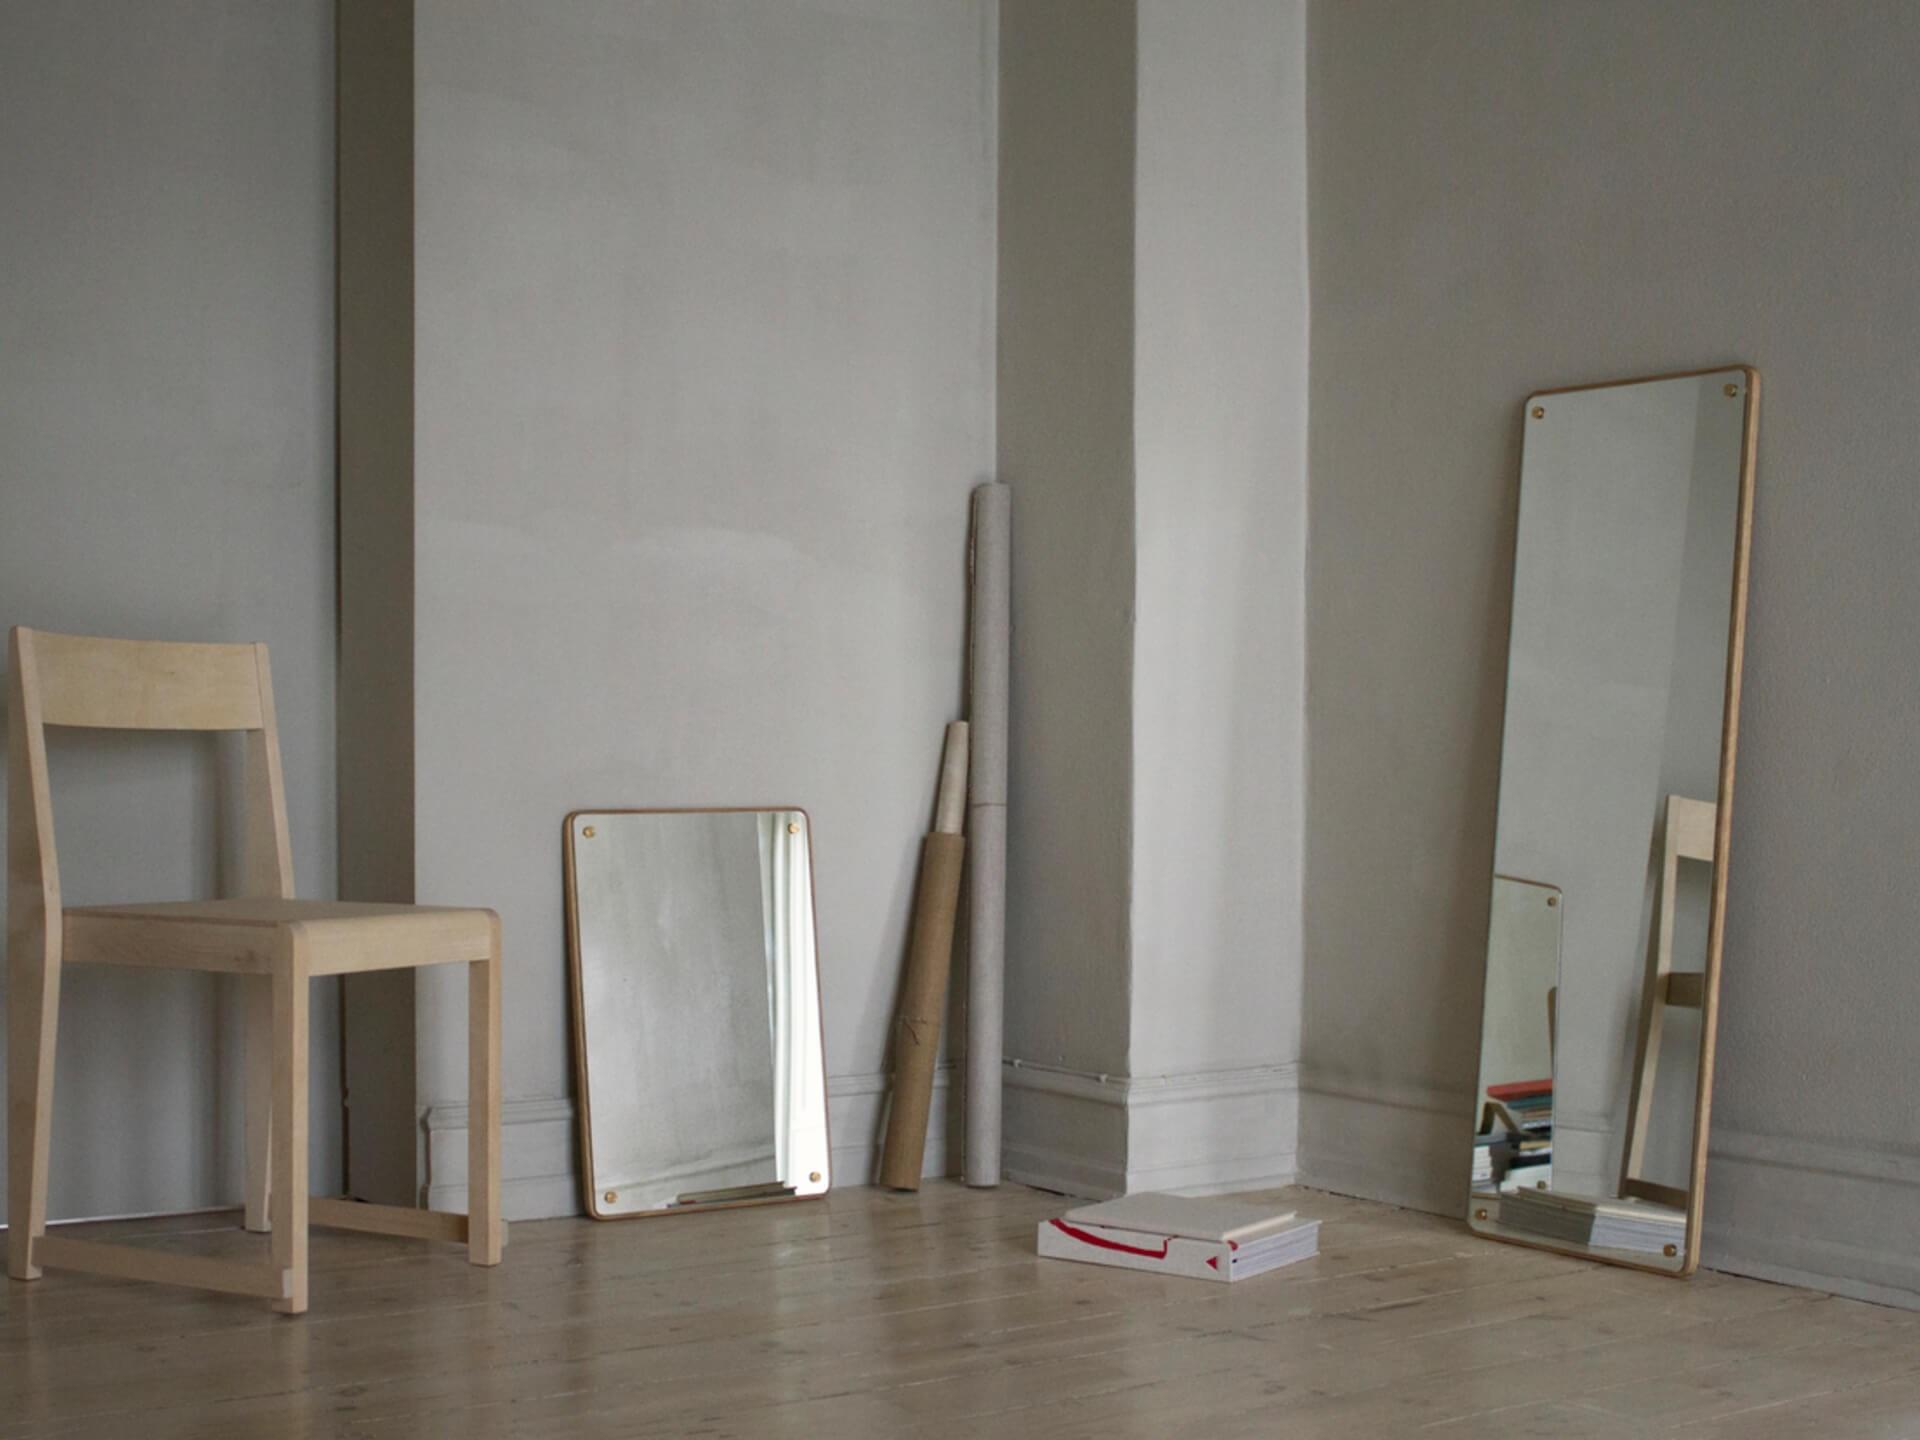 Frama RM-1 mirror